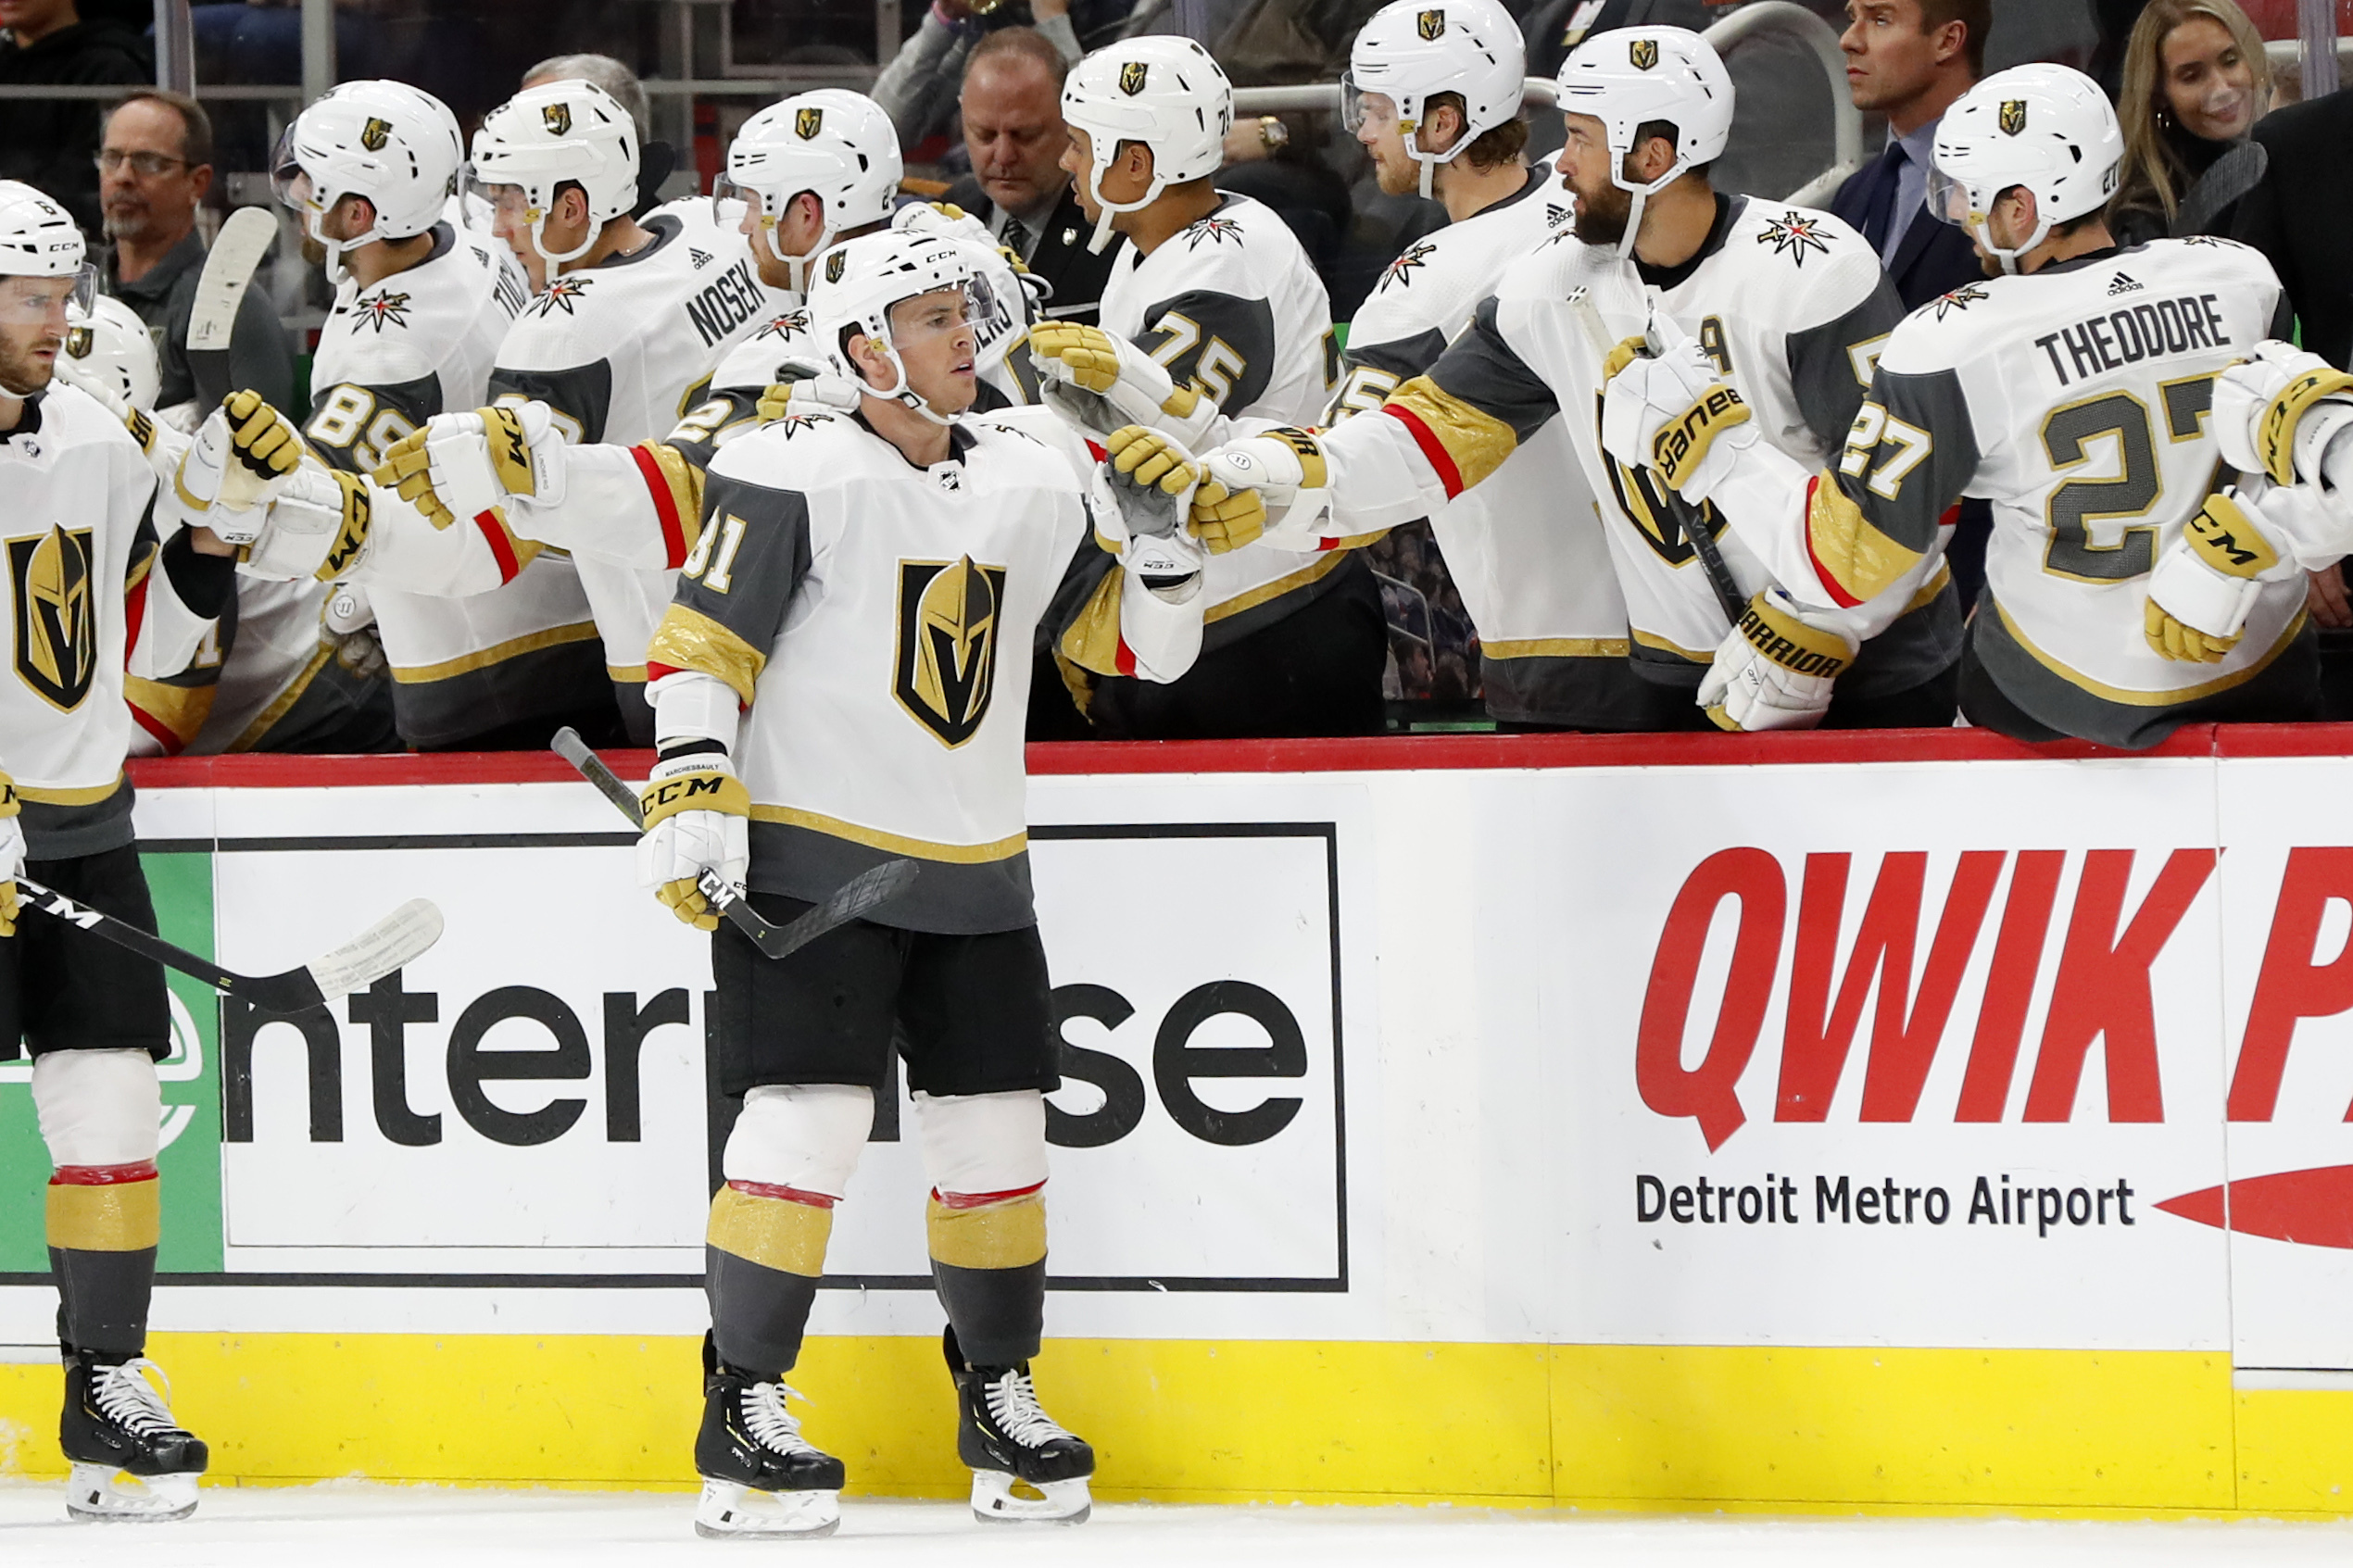 Marchessault scores 2 to lift Vegas over Detroit 4-2